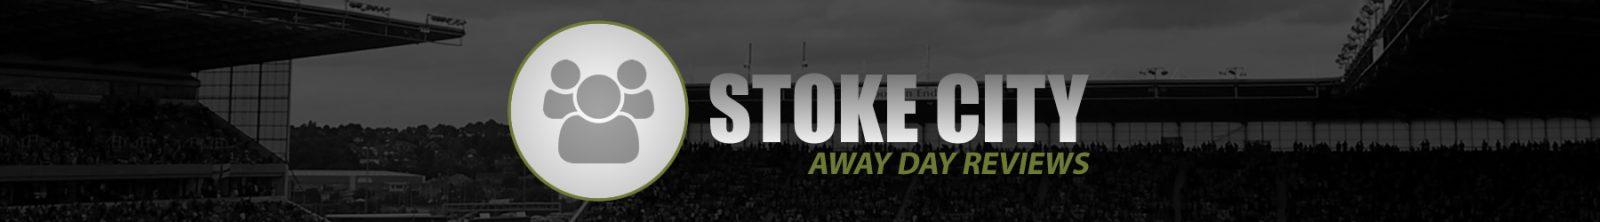 Review Stoke City